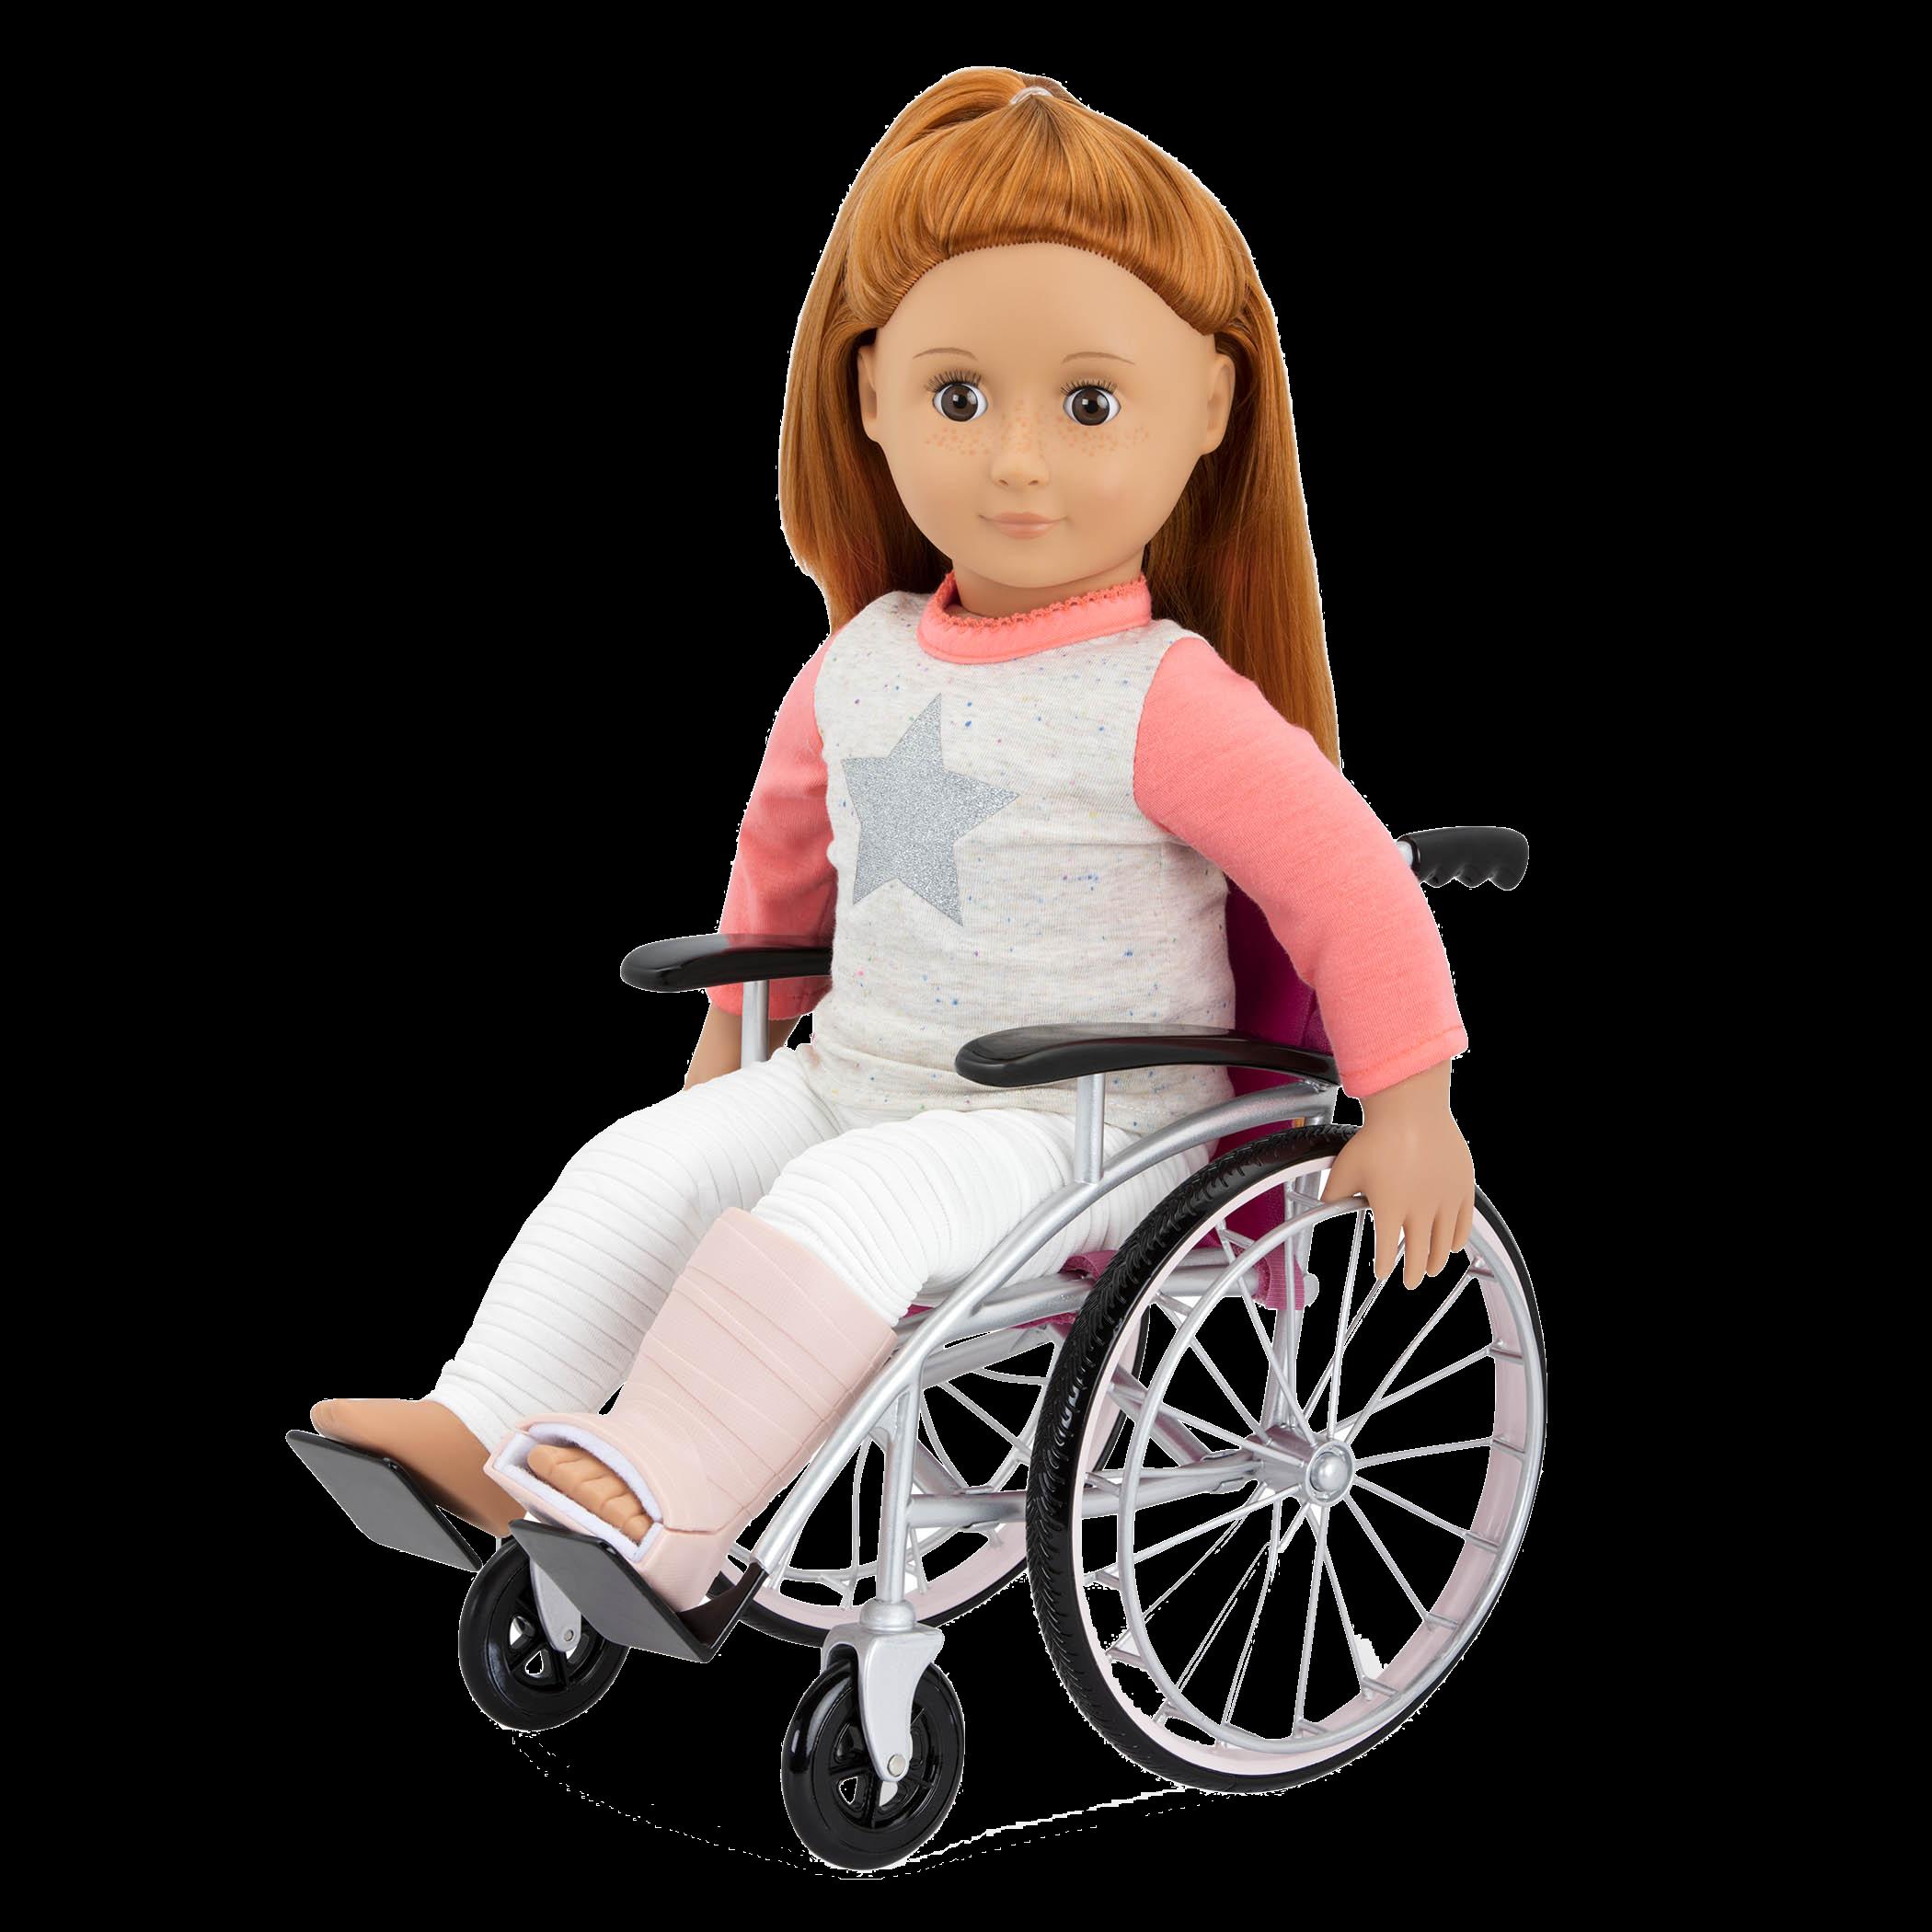 Heals on Wheels medical Accessories Noa in wheelchair